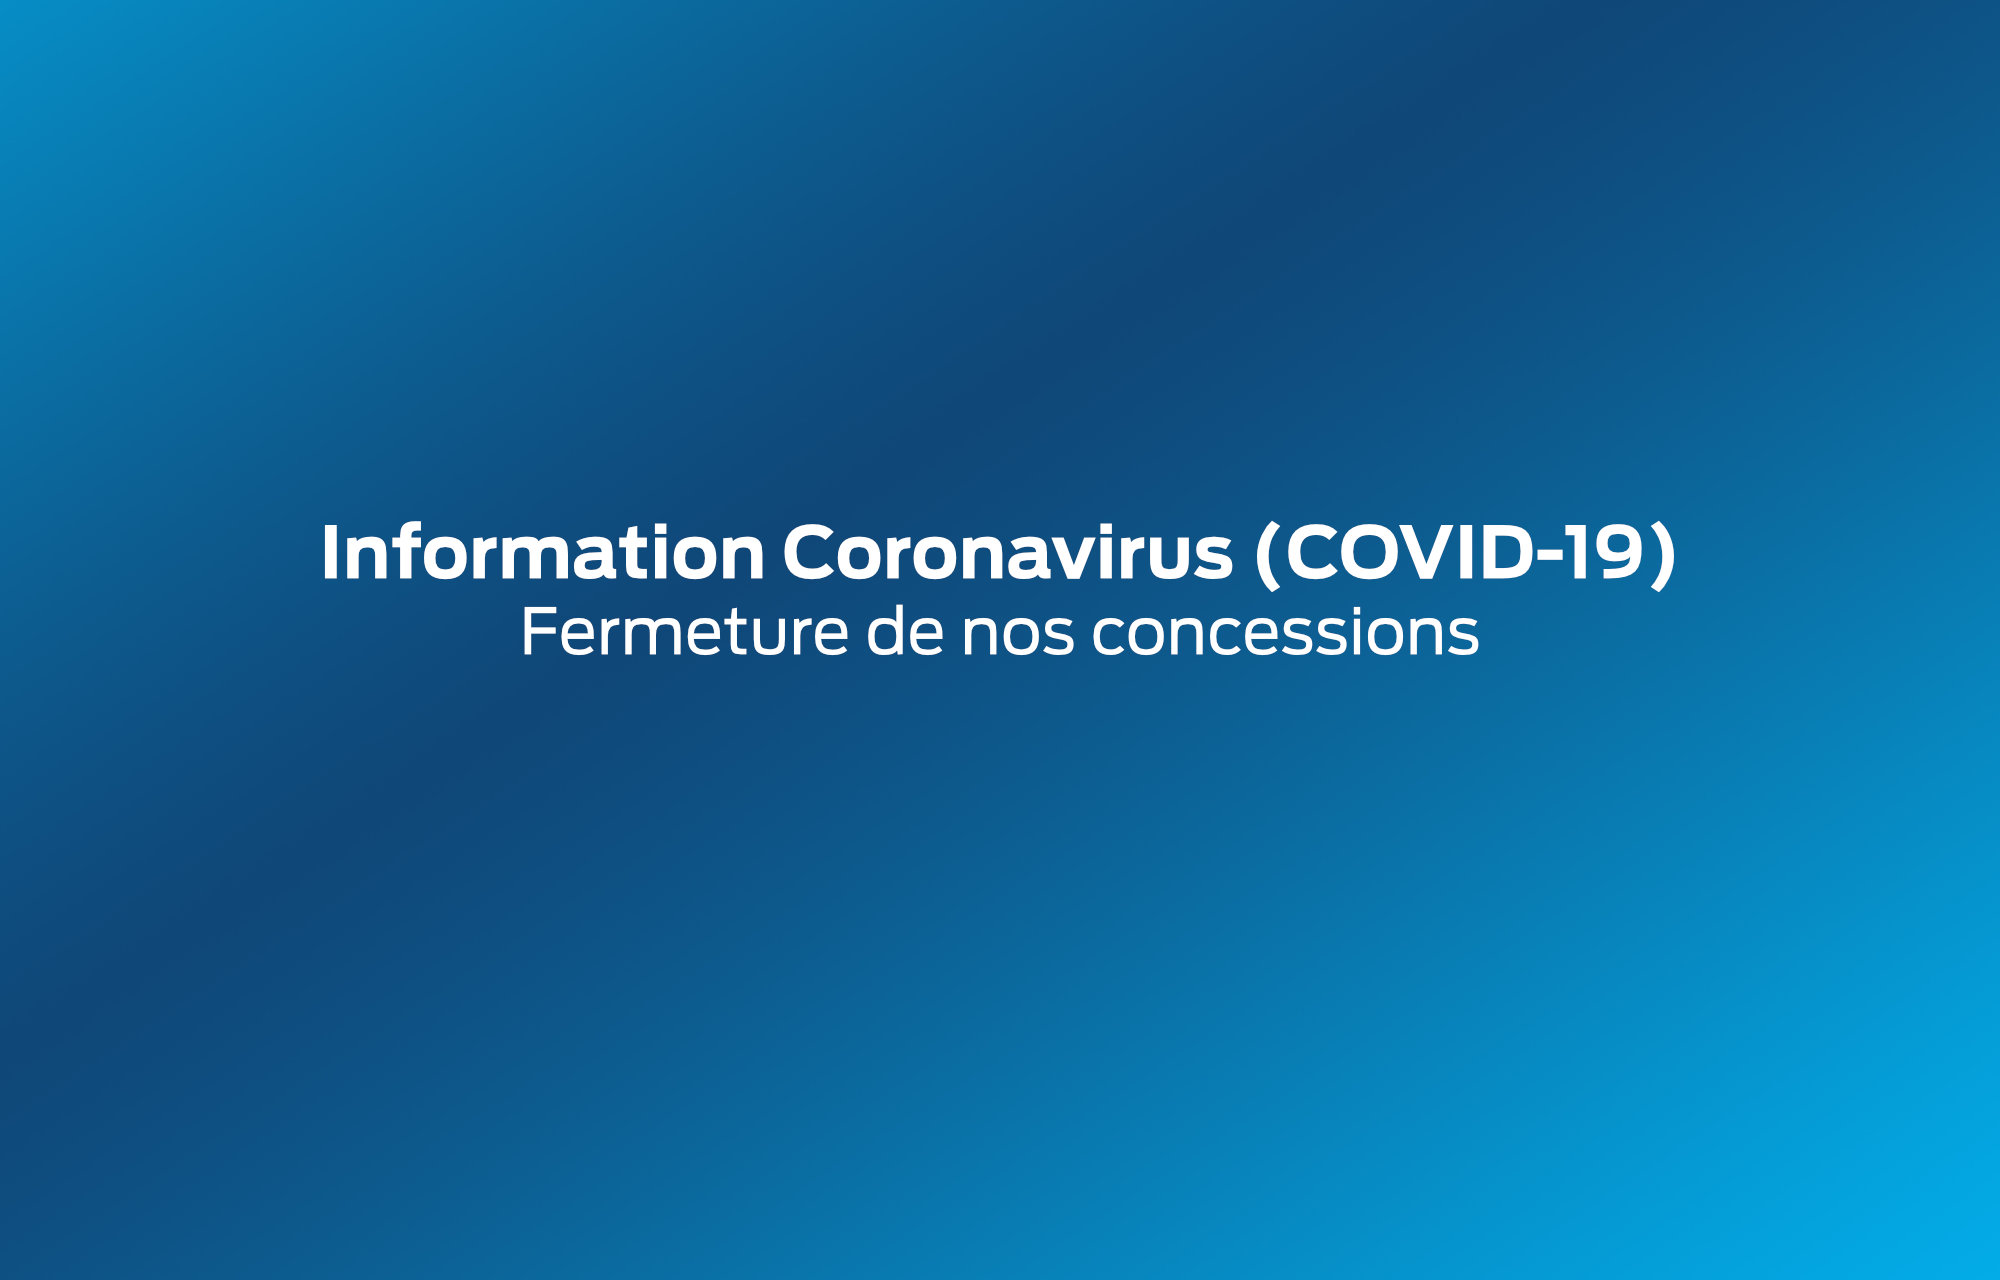 **Information importante : COVID-19**